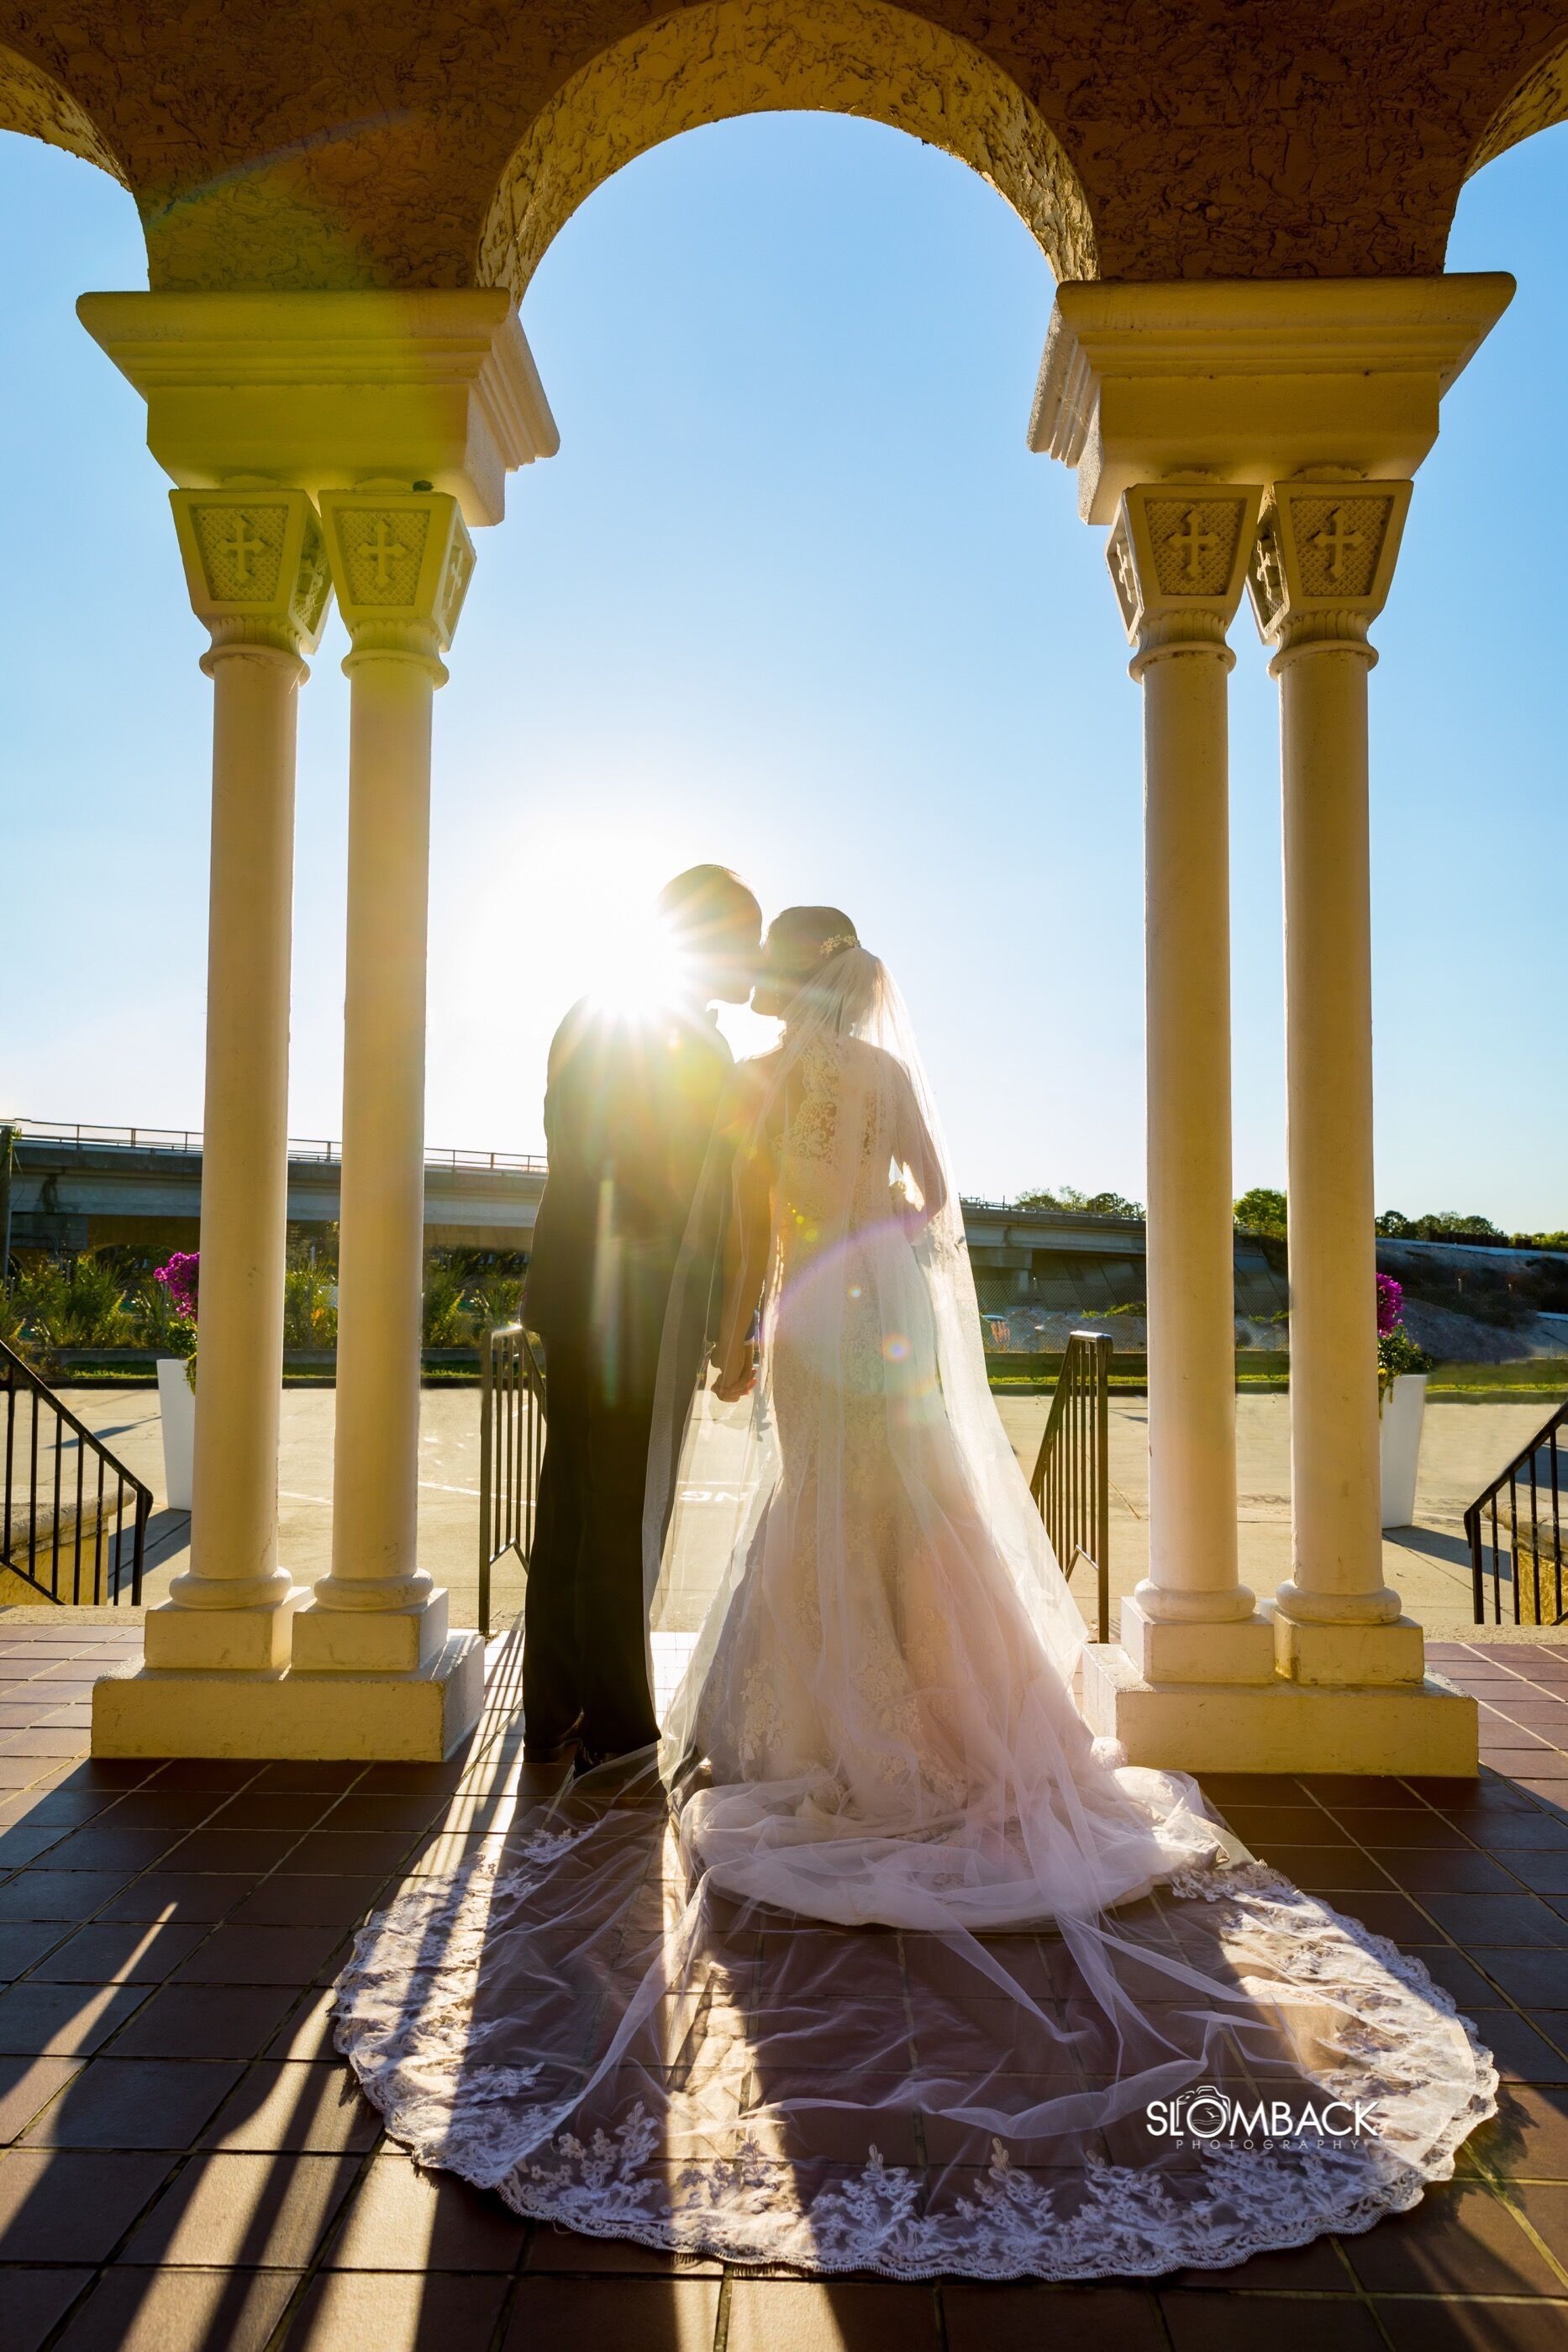 Wedding Venues in Orlando, FL - The Knot